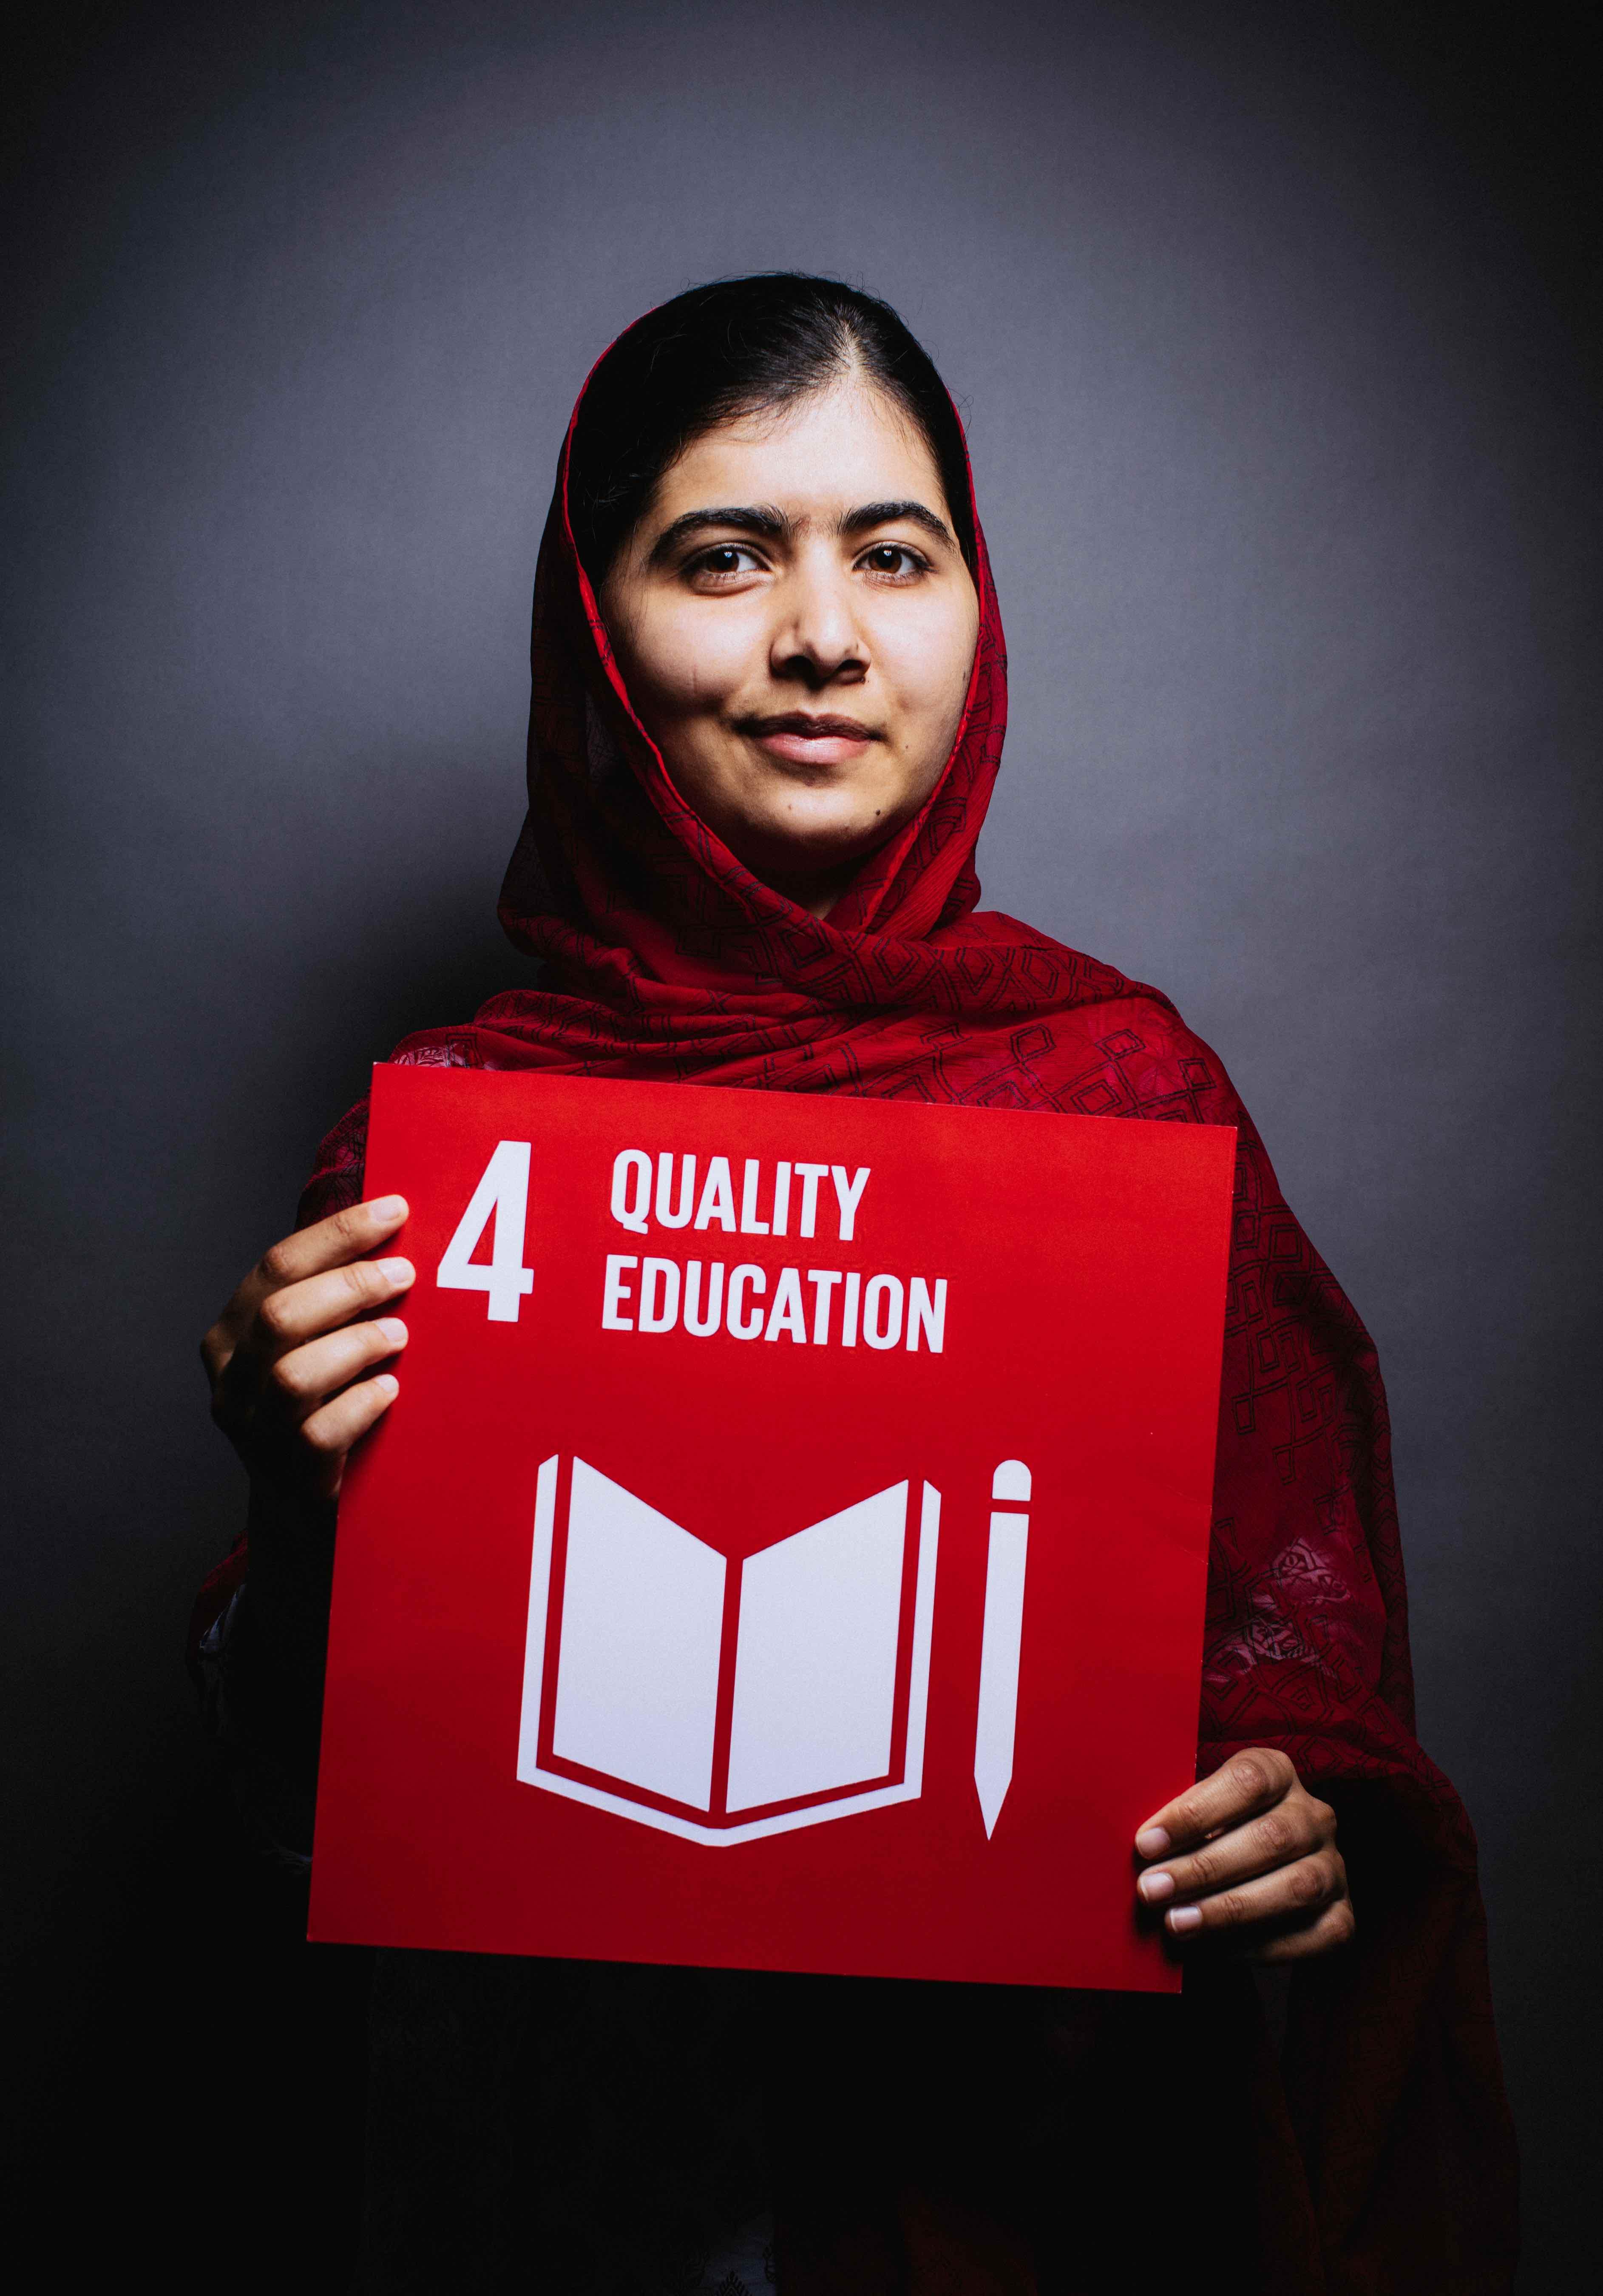 Malala Yousafzai Picks Goal 4 Quality Education The Global